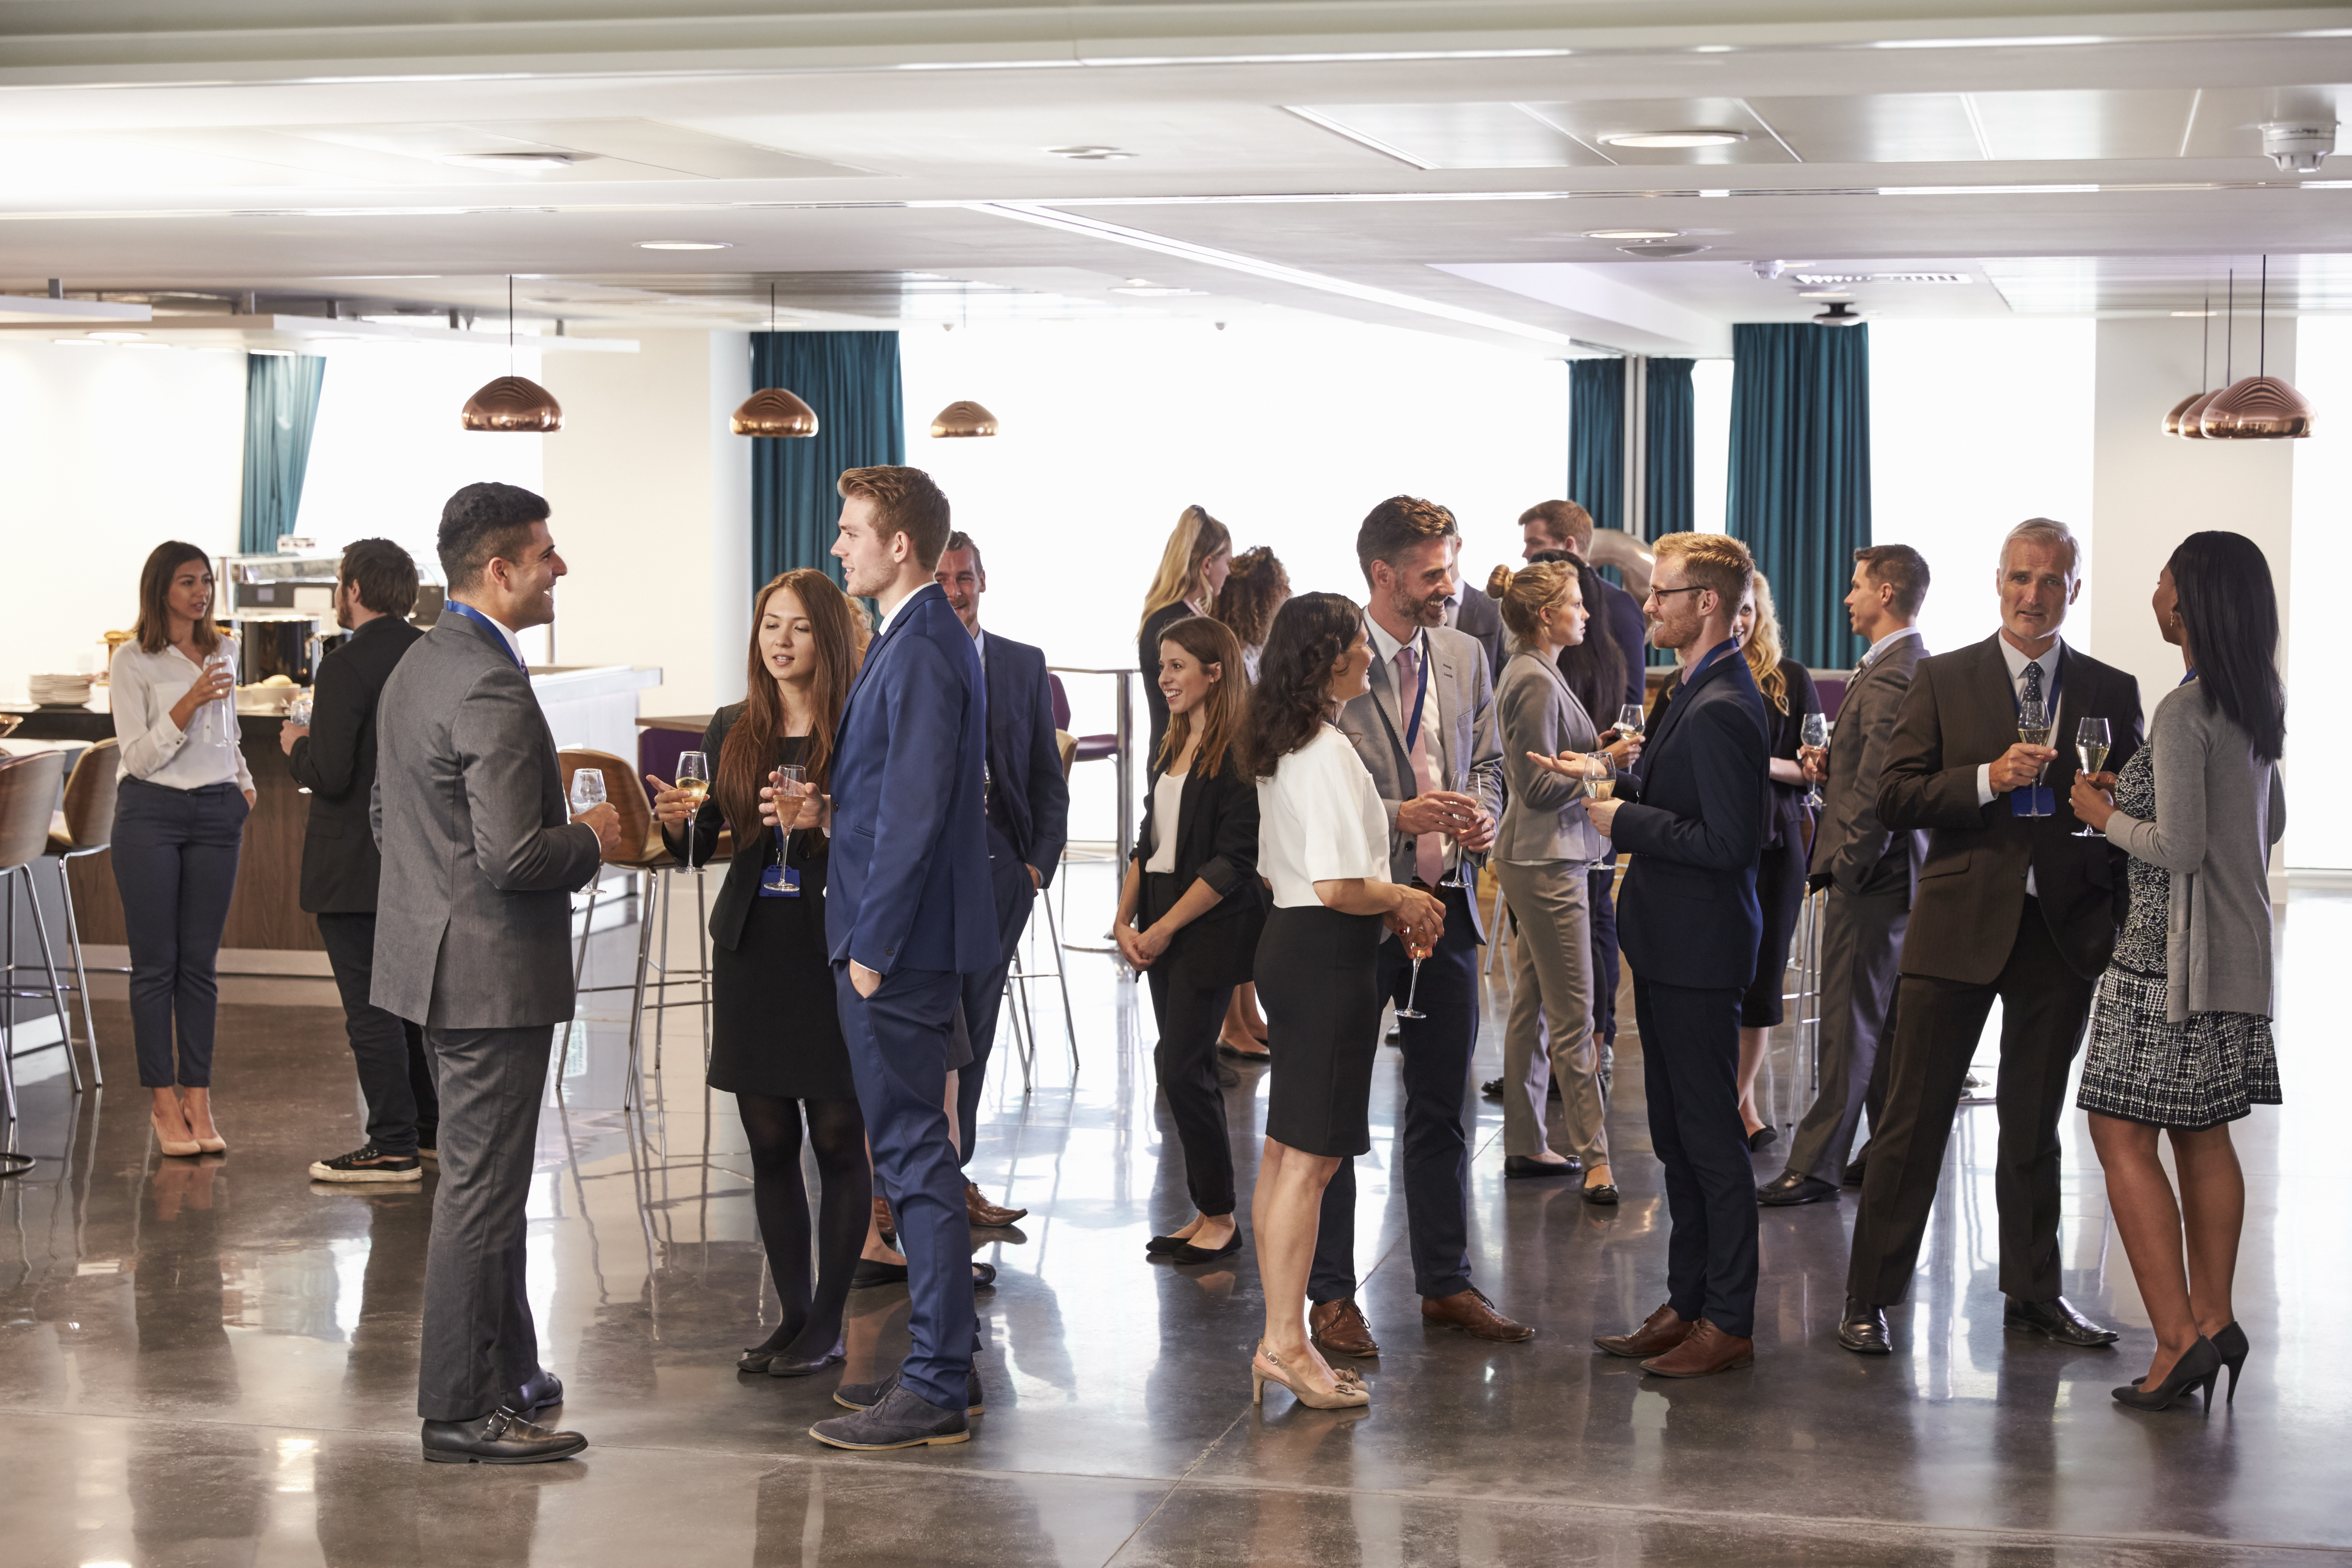 delegates-networking-at-conference-drinks-PJX2DZ7